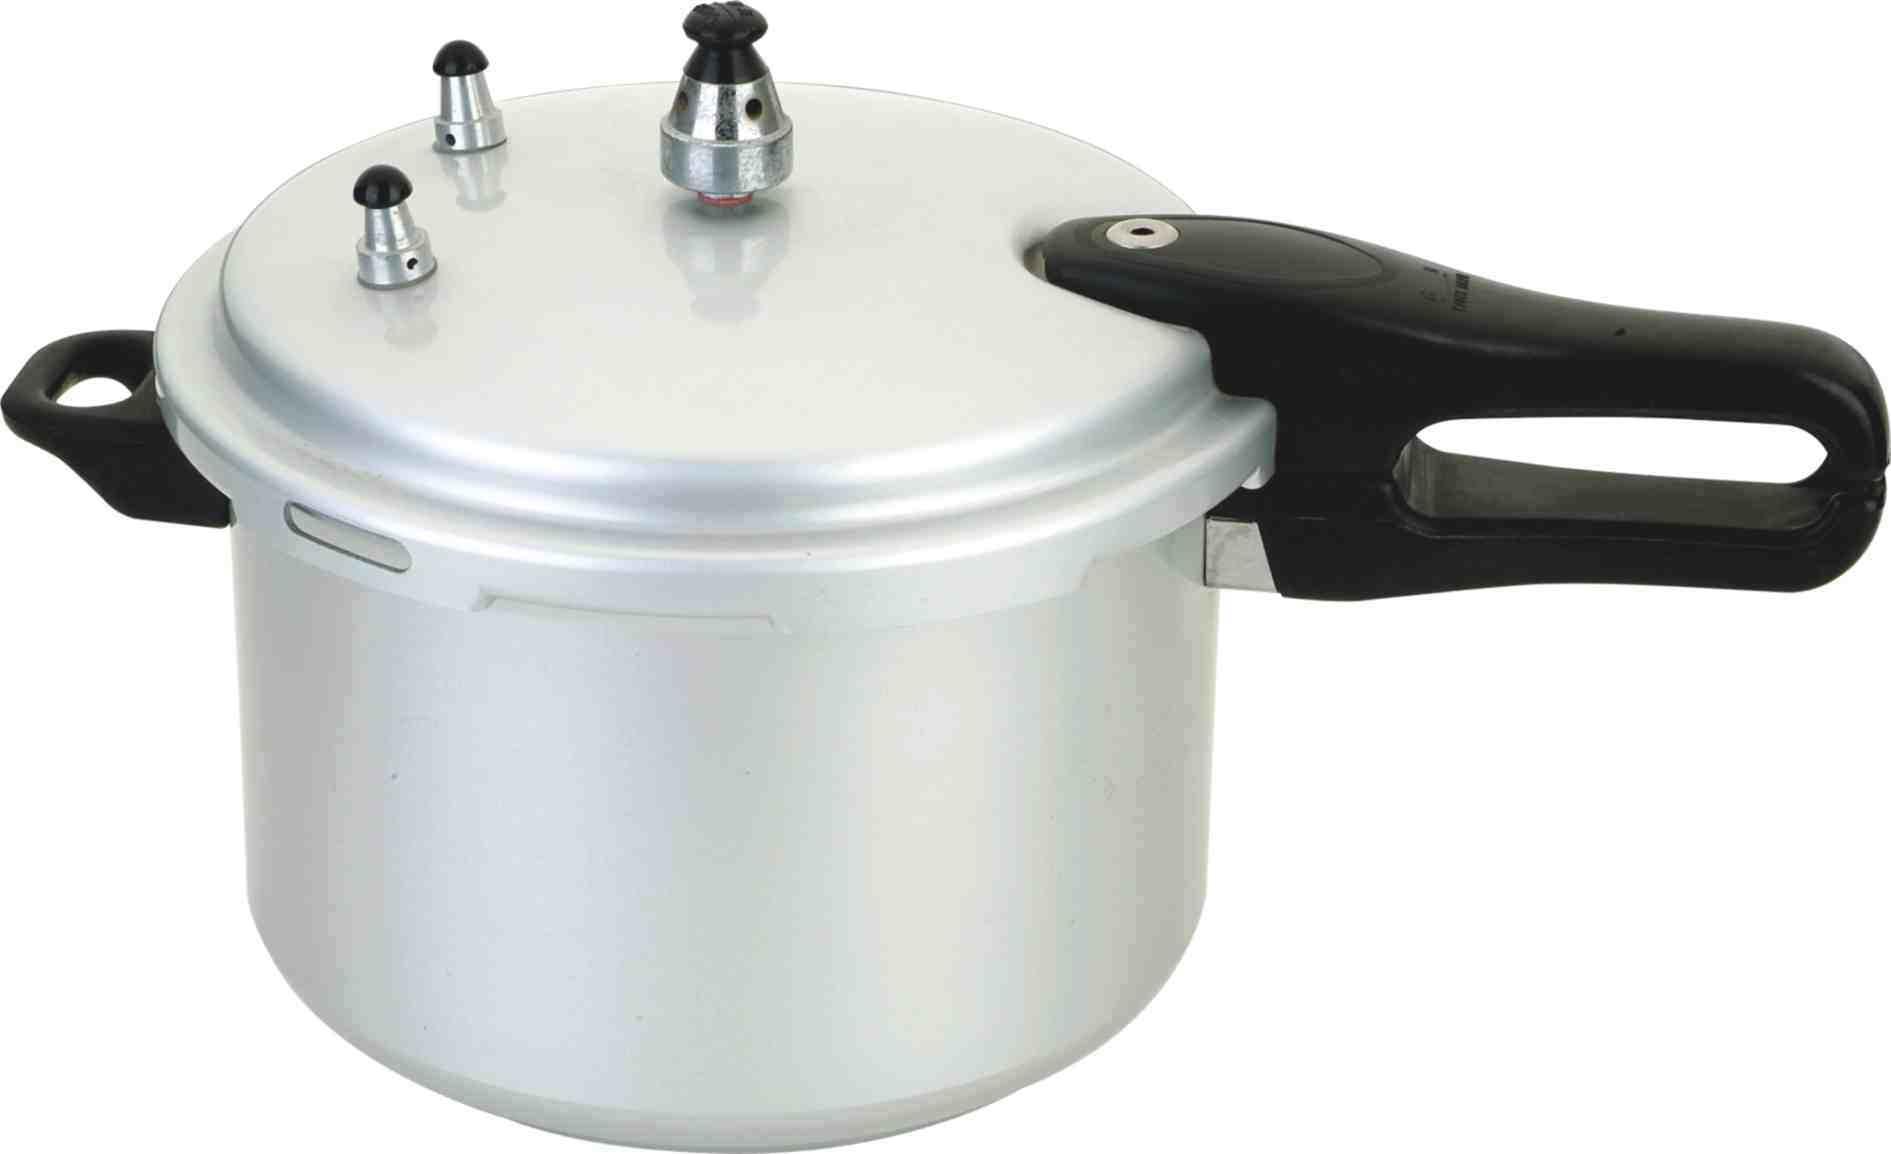 China Pressure Cooker China Cooker Pressure Cooker